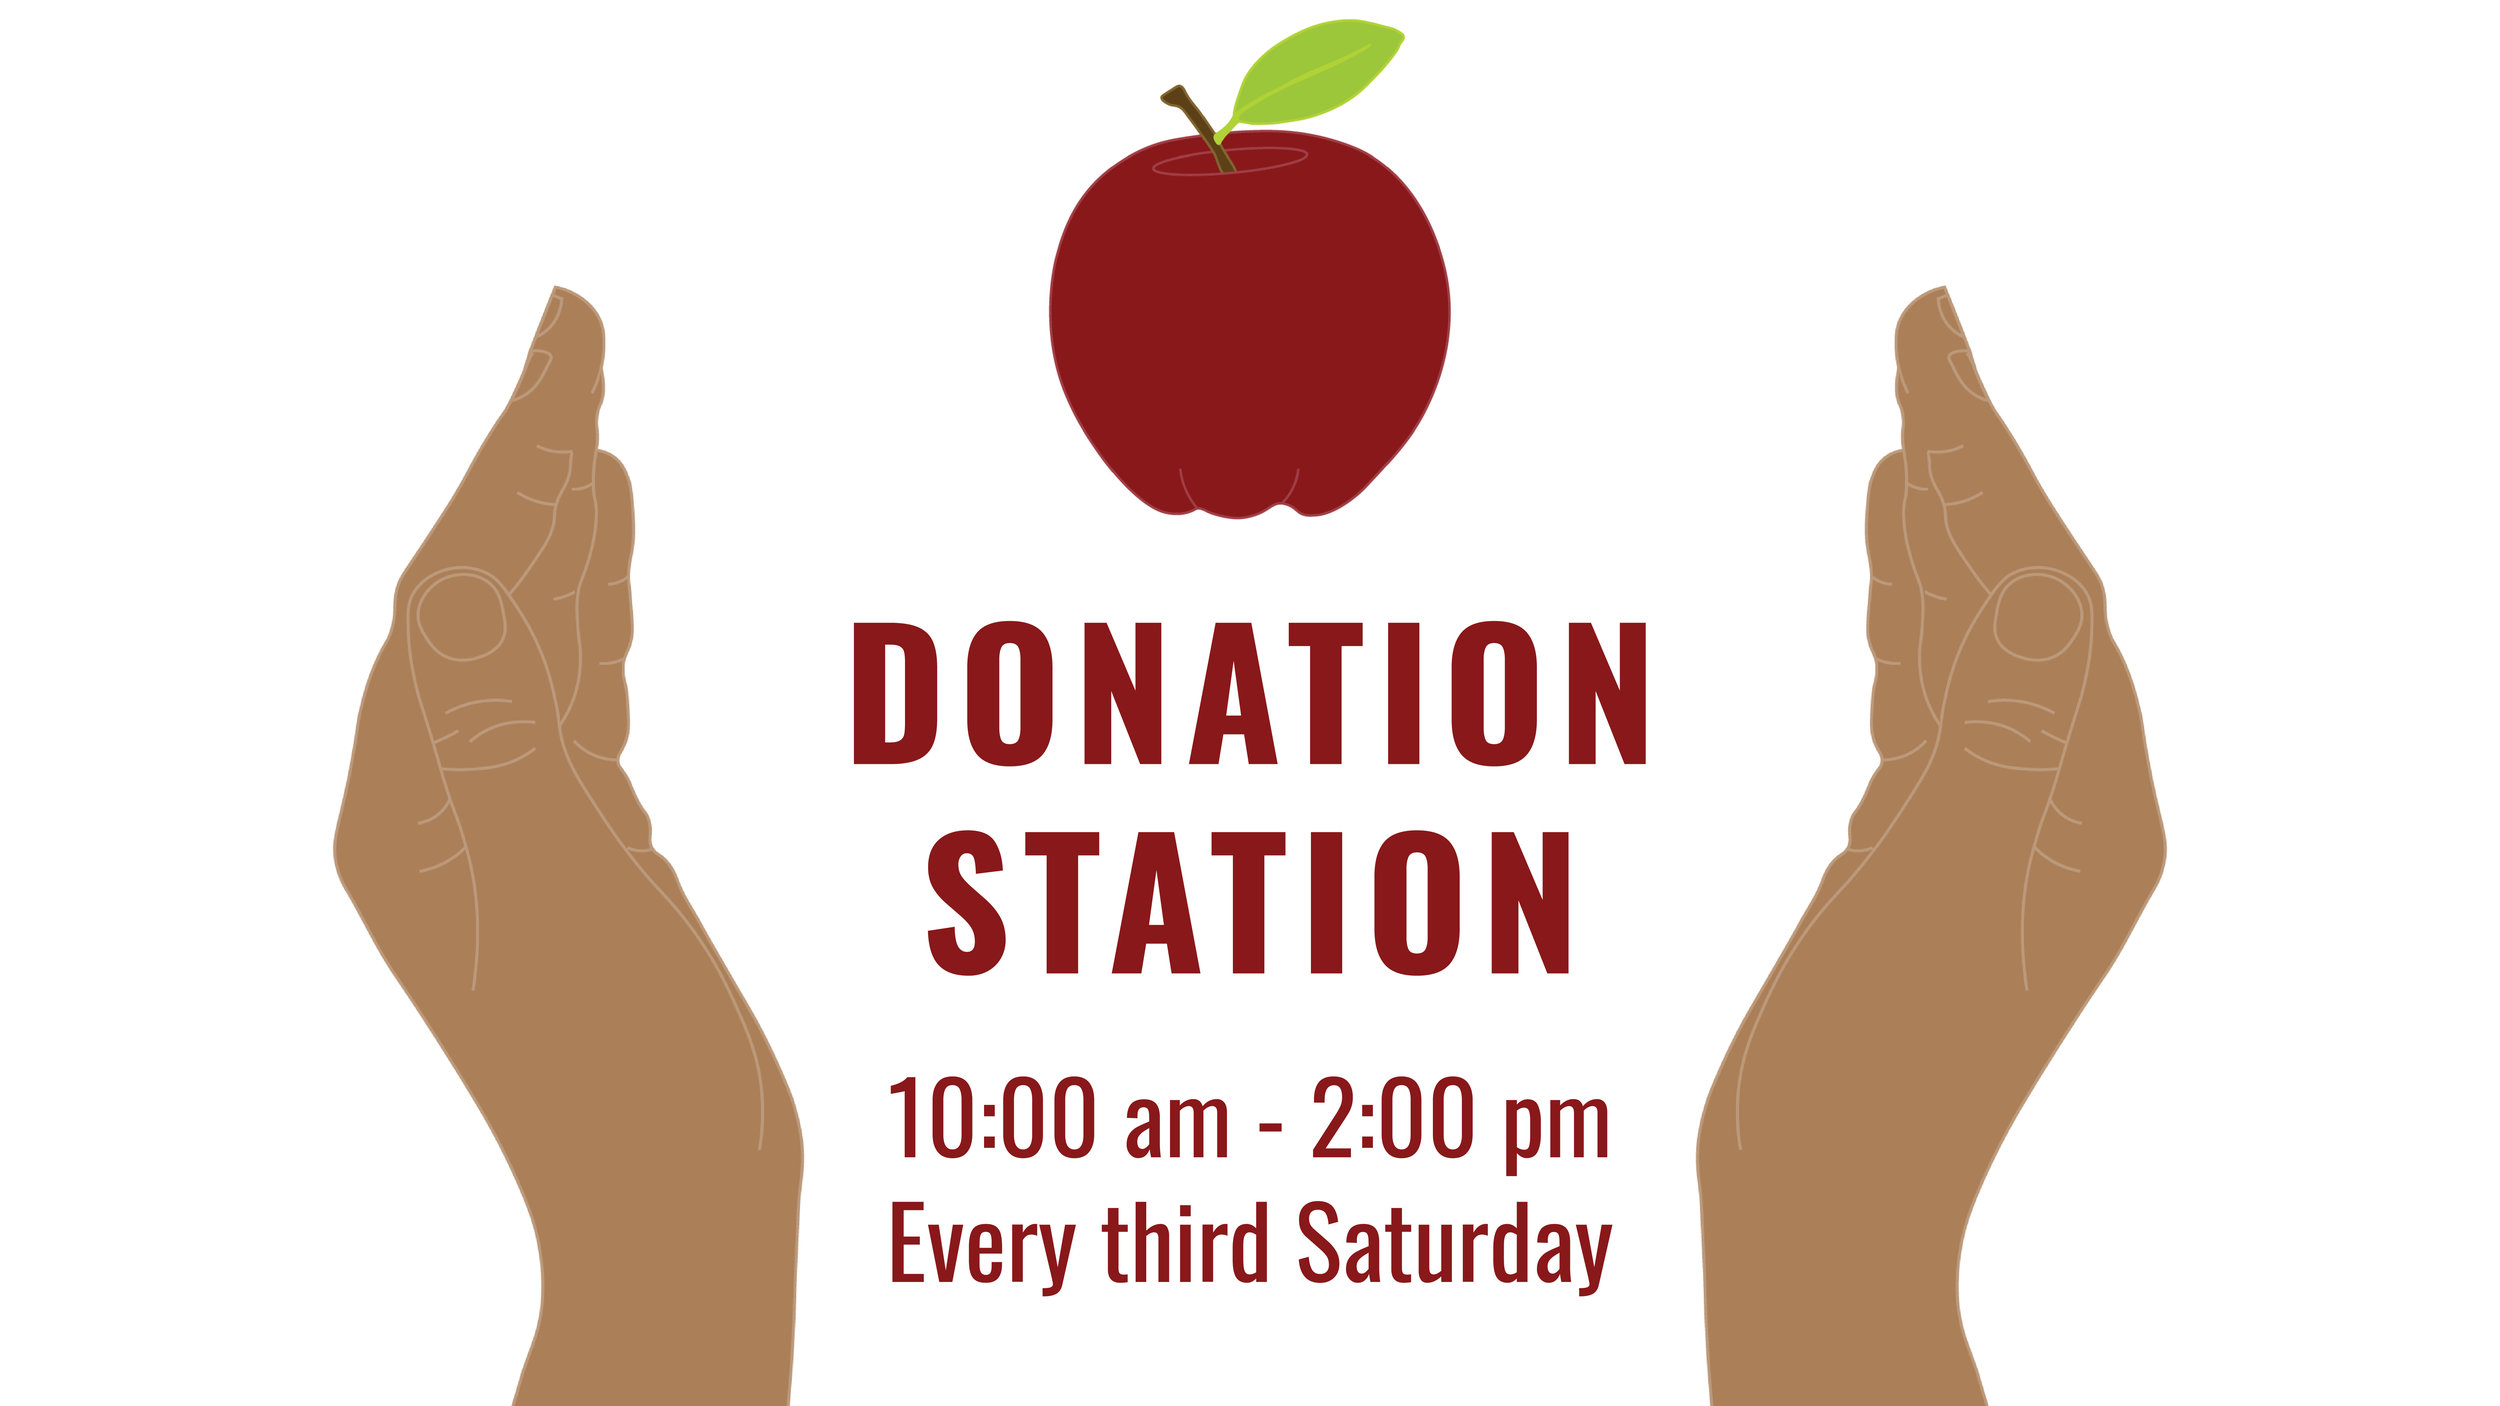 180718 GENERIC Donation Station FB Event Image.jpg